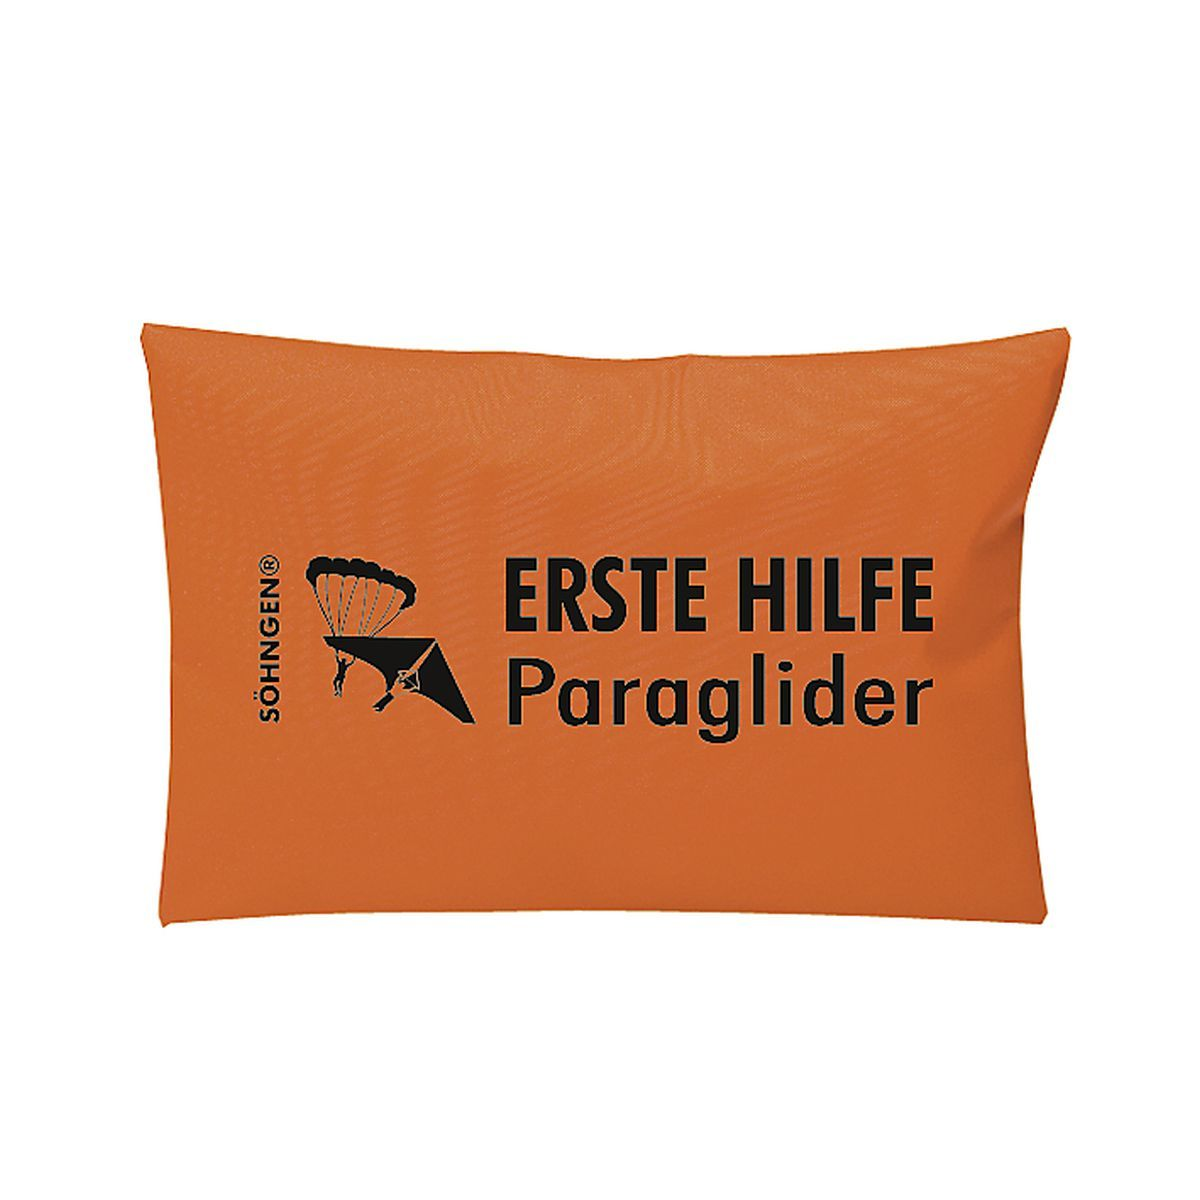 Erste Hilfe Paraglider orange